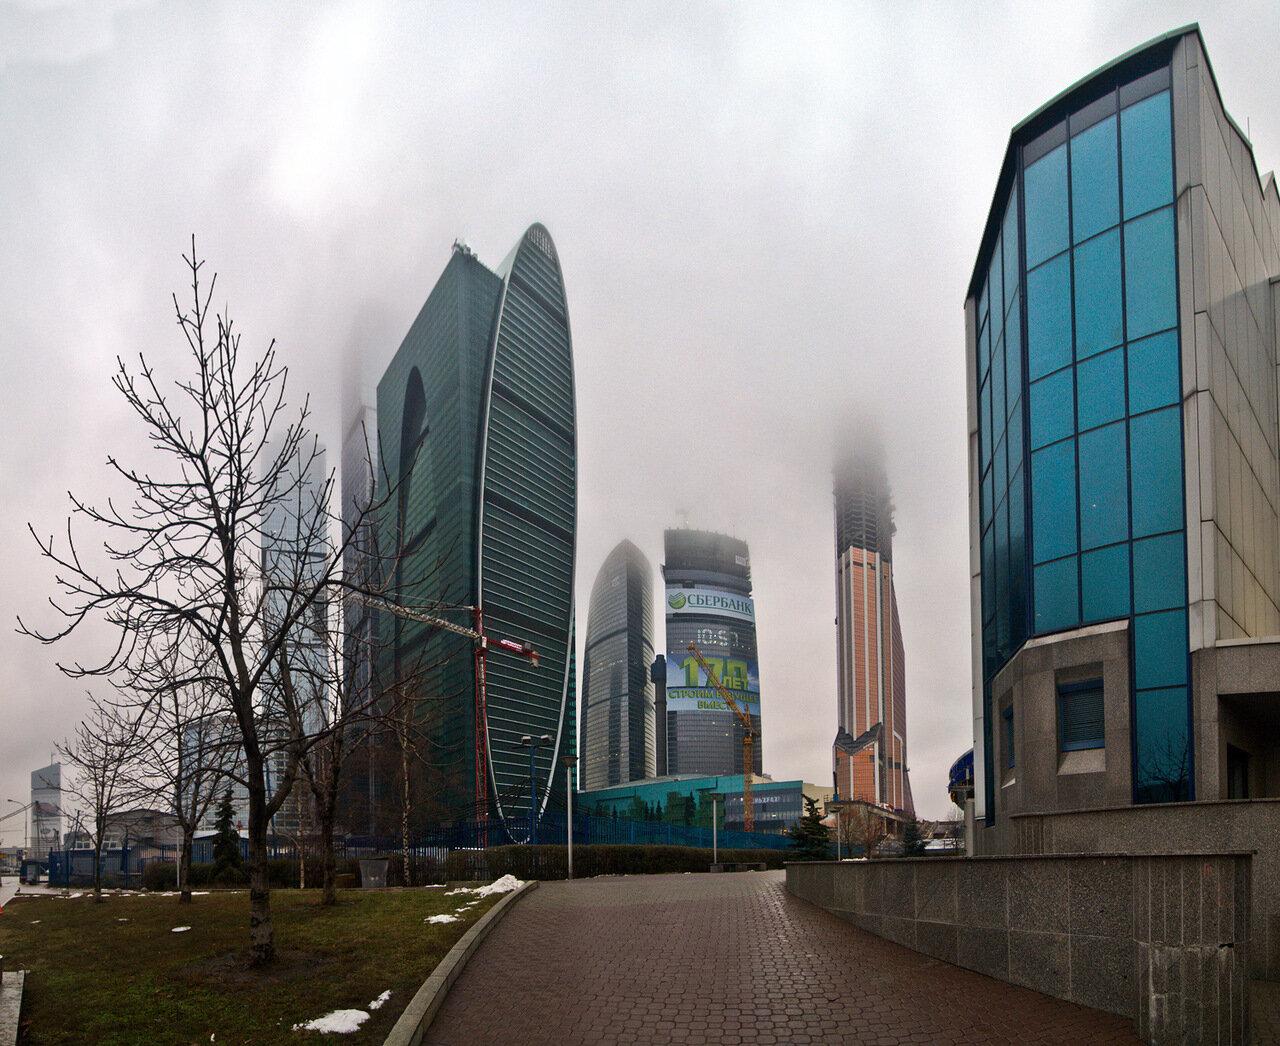 http://img-fotki.yandex.ru/get/4524/50484535.61/0_57d62_98942342_XXXL.jpg